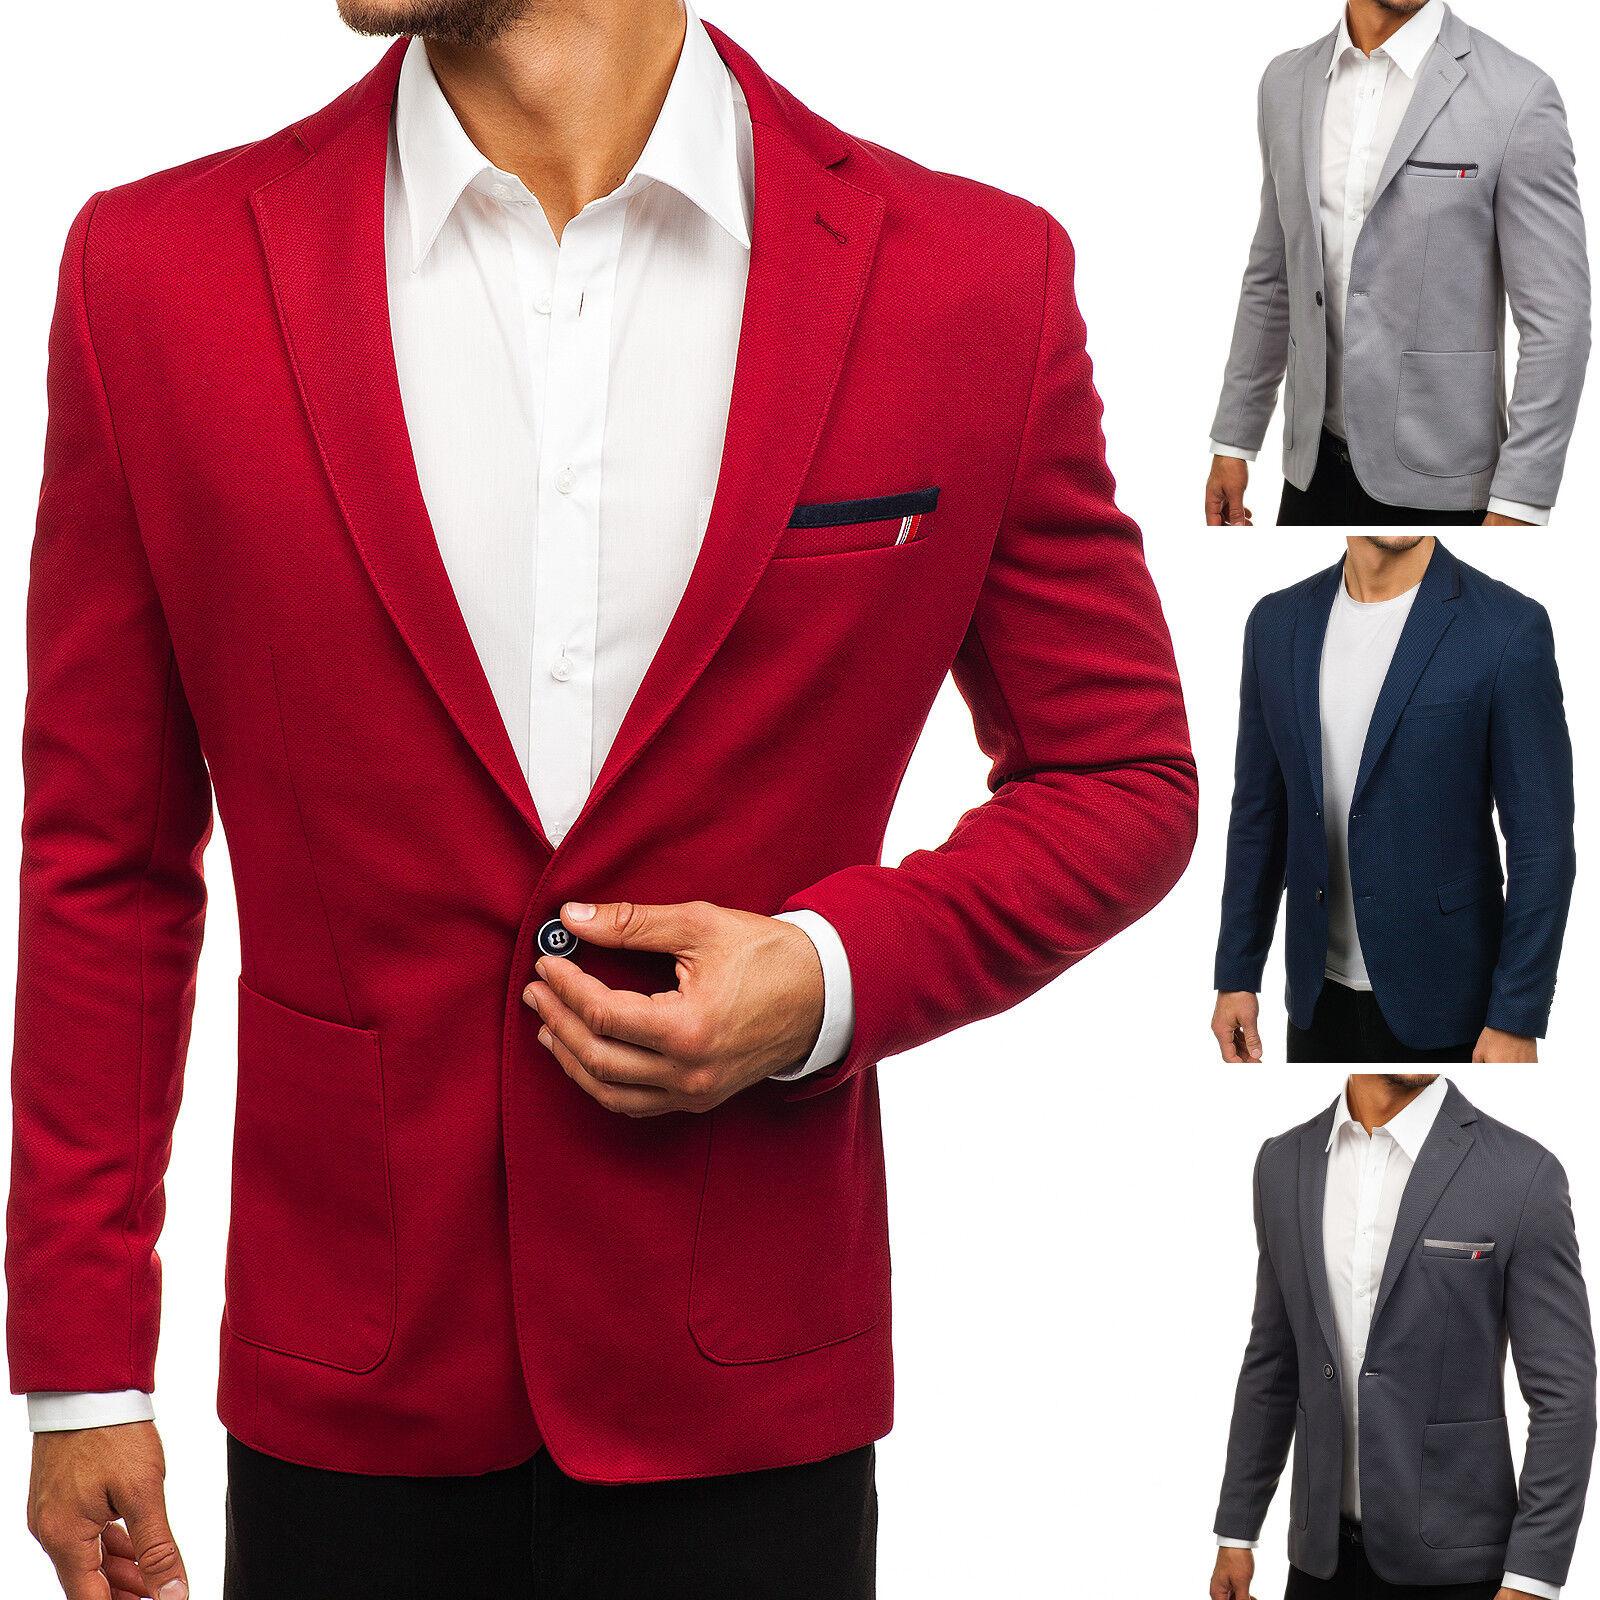 Herren Sakko Anzug Jacke Sweatjacke Blazer Classic Slim Fit Mix BOLF 4D4 Casual